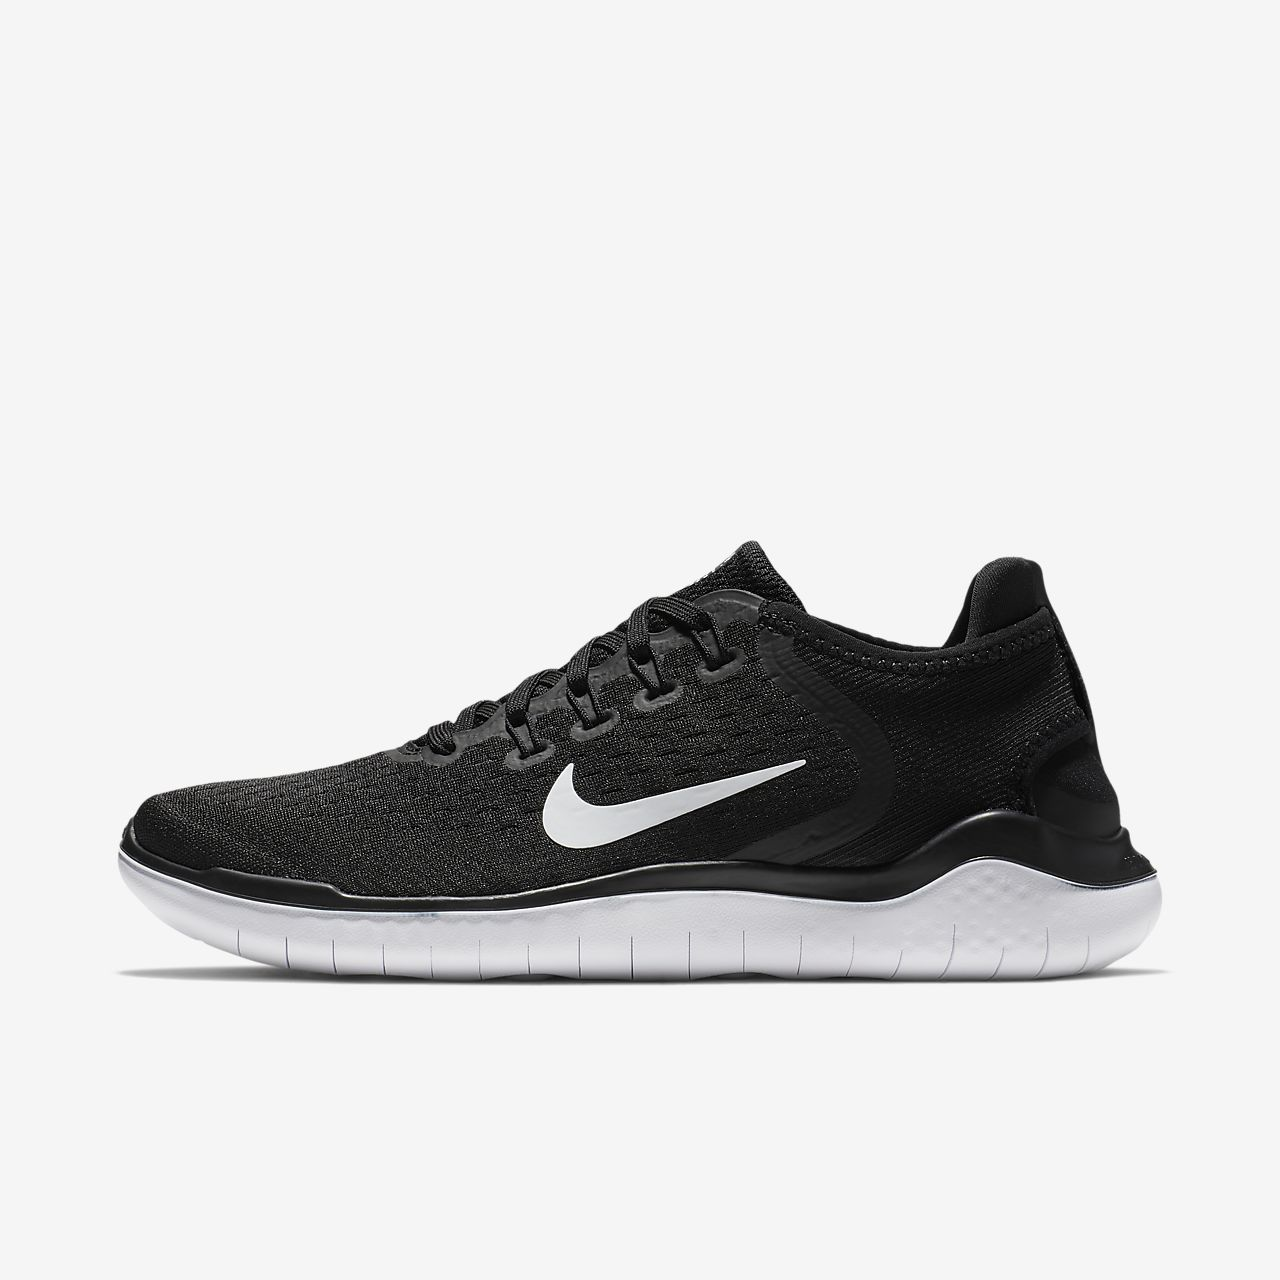 chaussure de running Nike Free rn pour femme